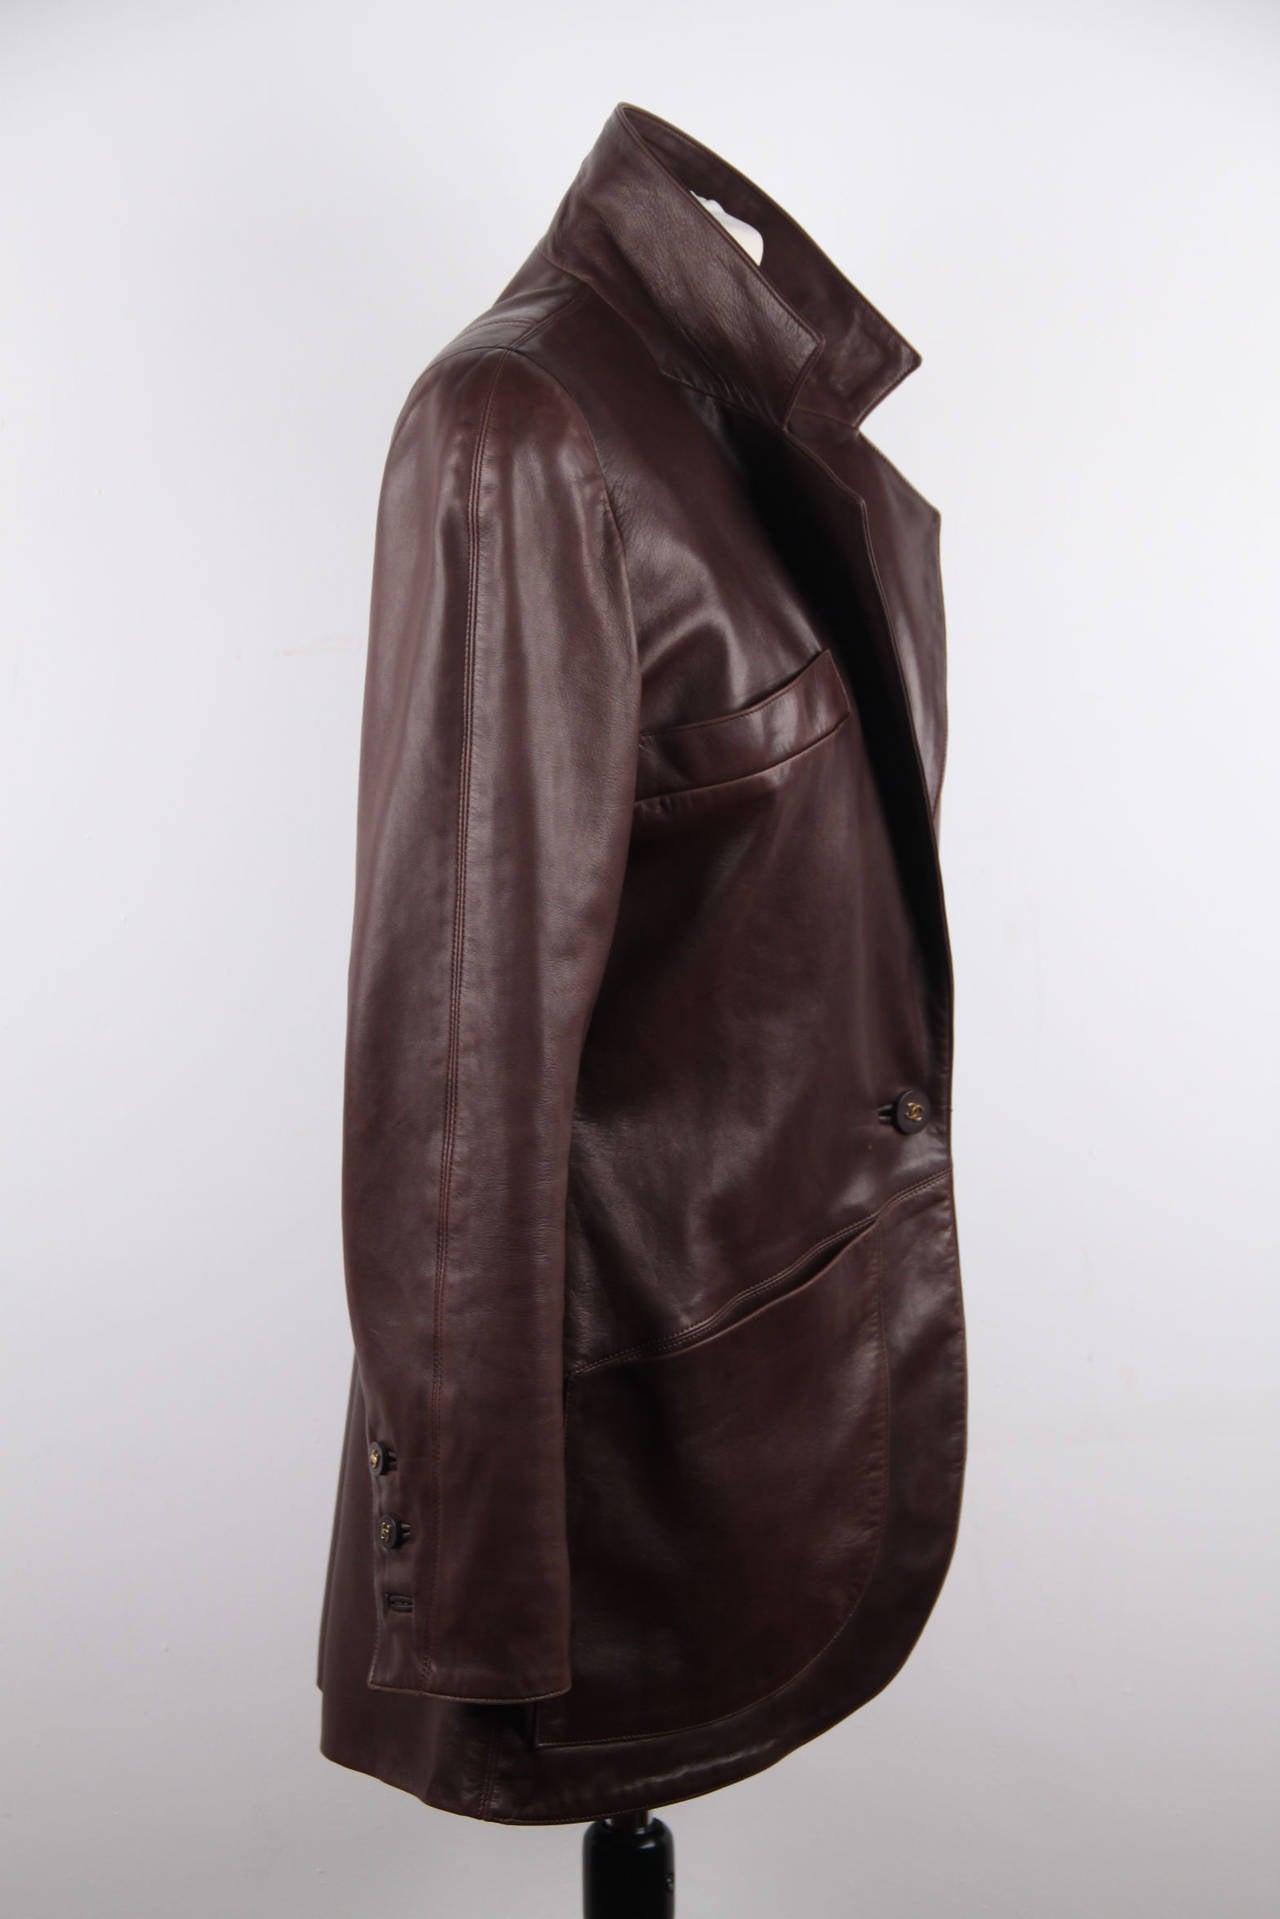 CHANEL BOUTIQUE VINTAGE Chocolate Brown LEATHER JACKET Blazer SIZE 38 FR 2